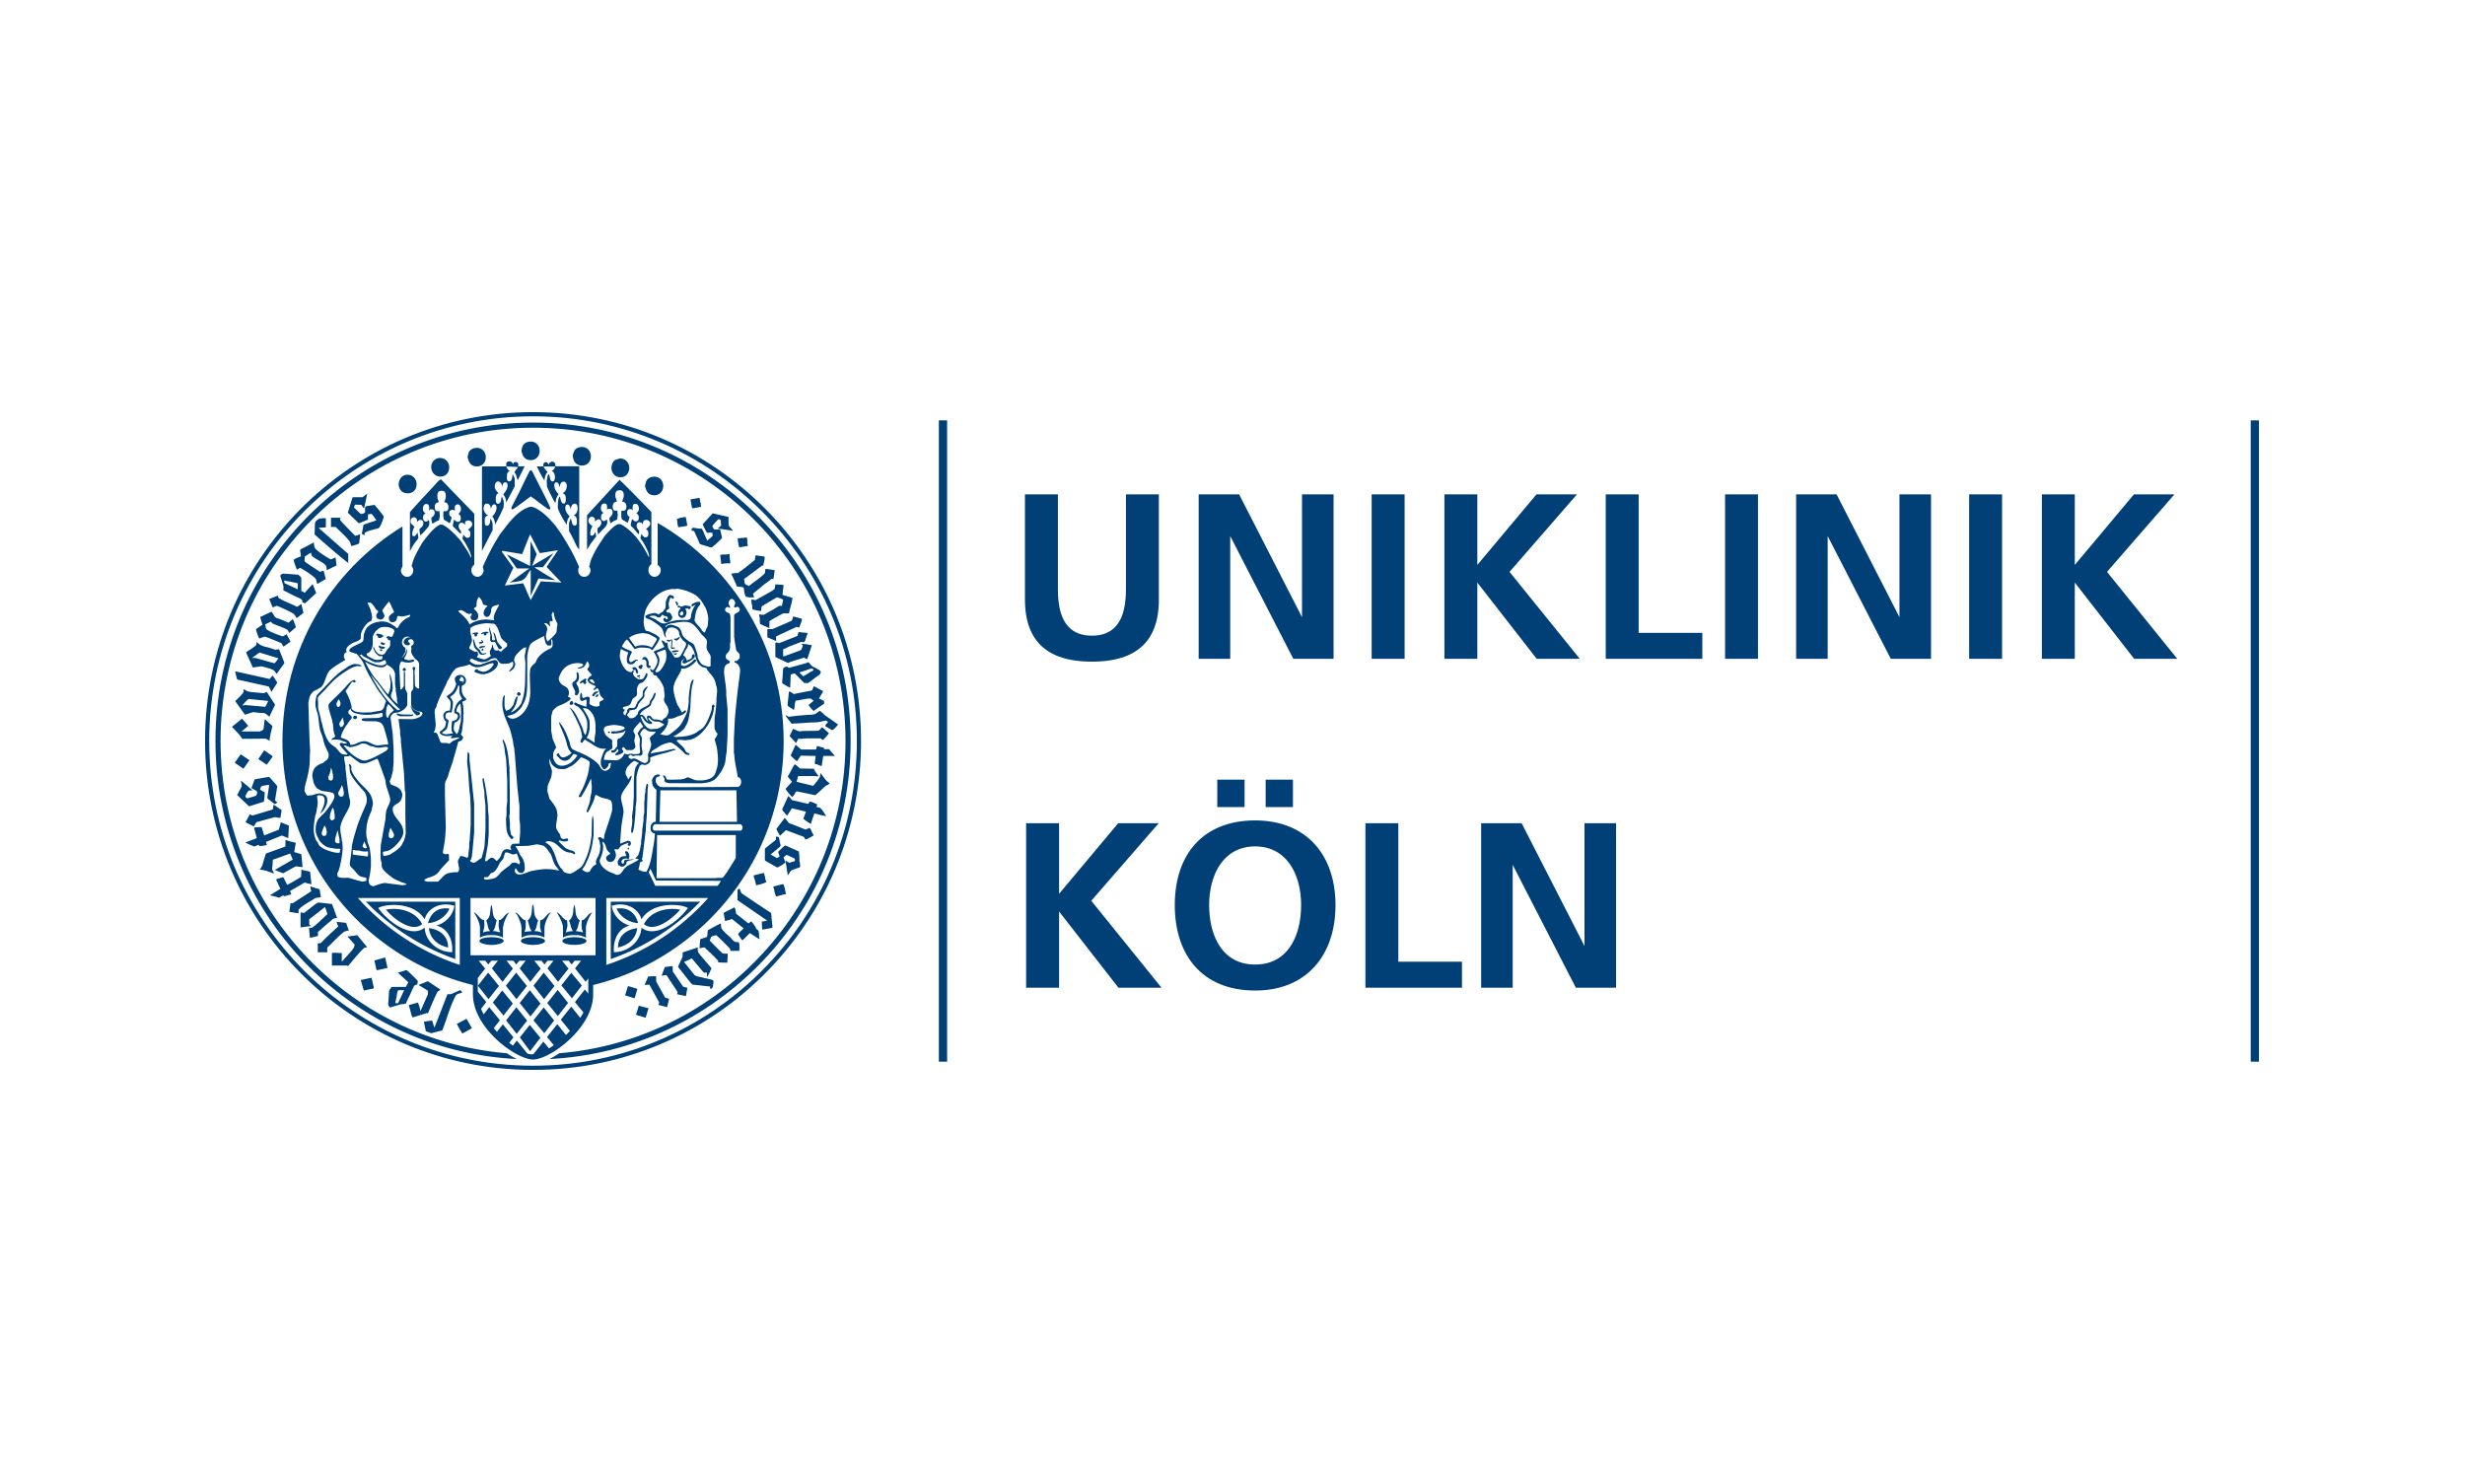 herzzentrum uniklinik kln - Online Bewerbung Uni Koln